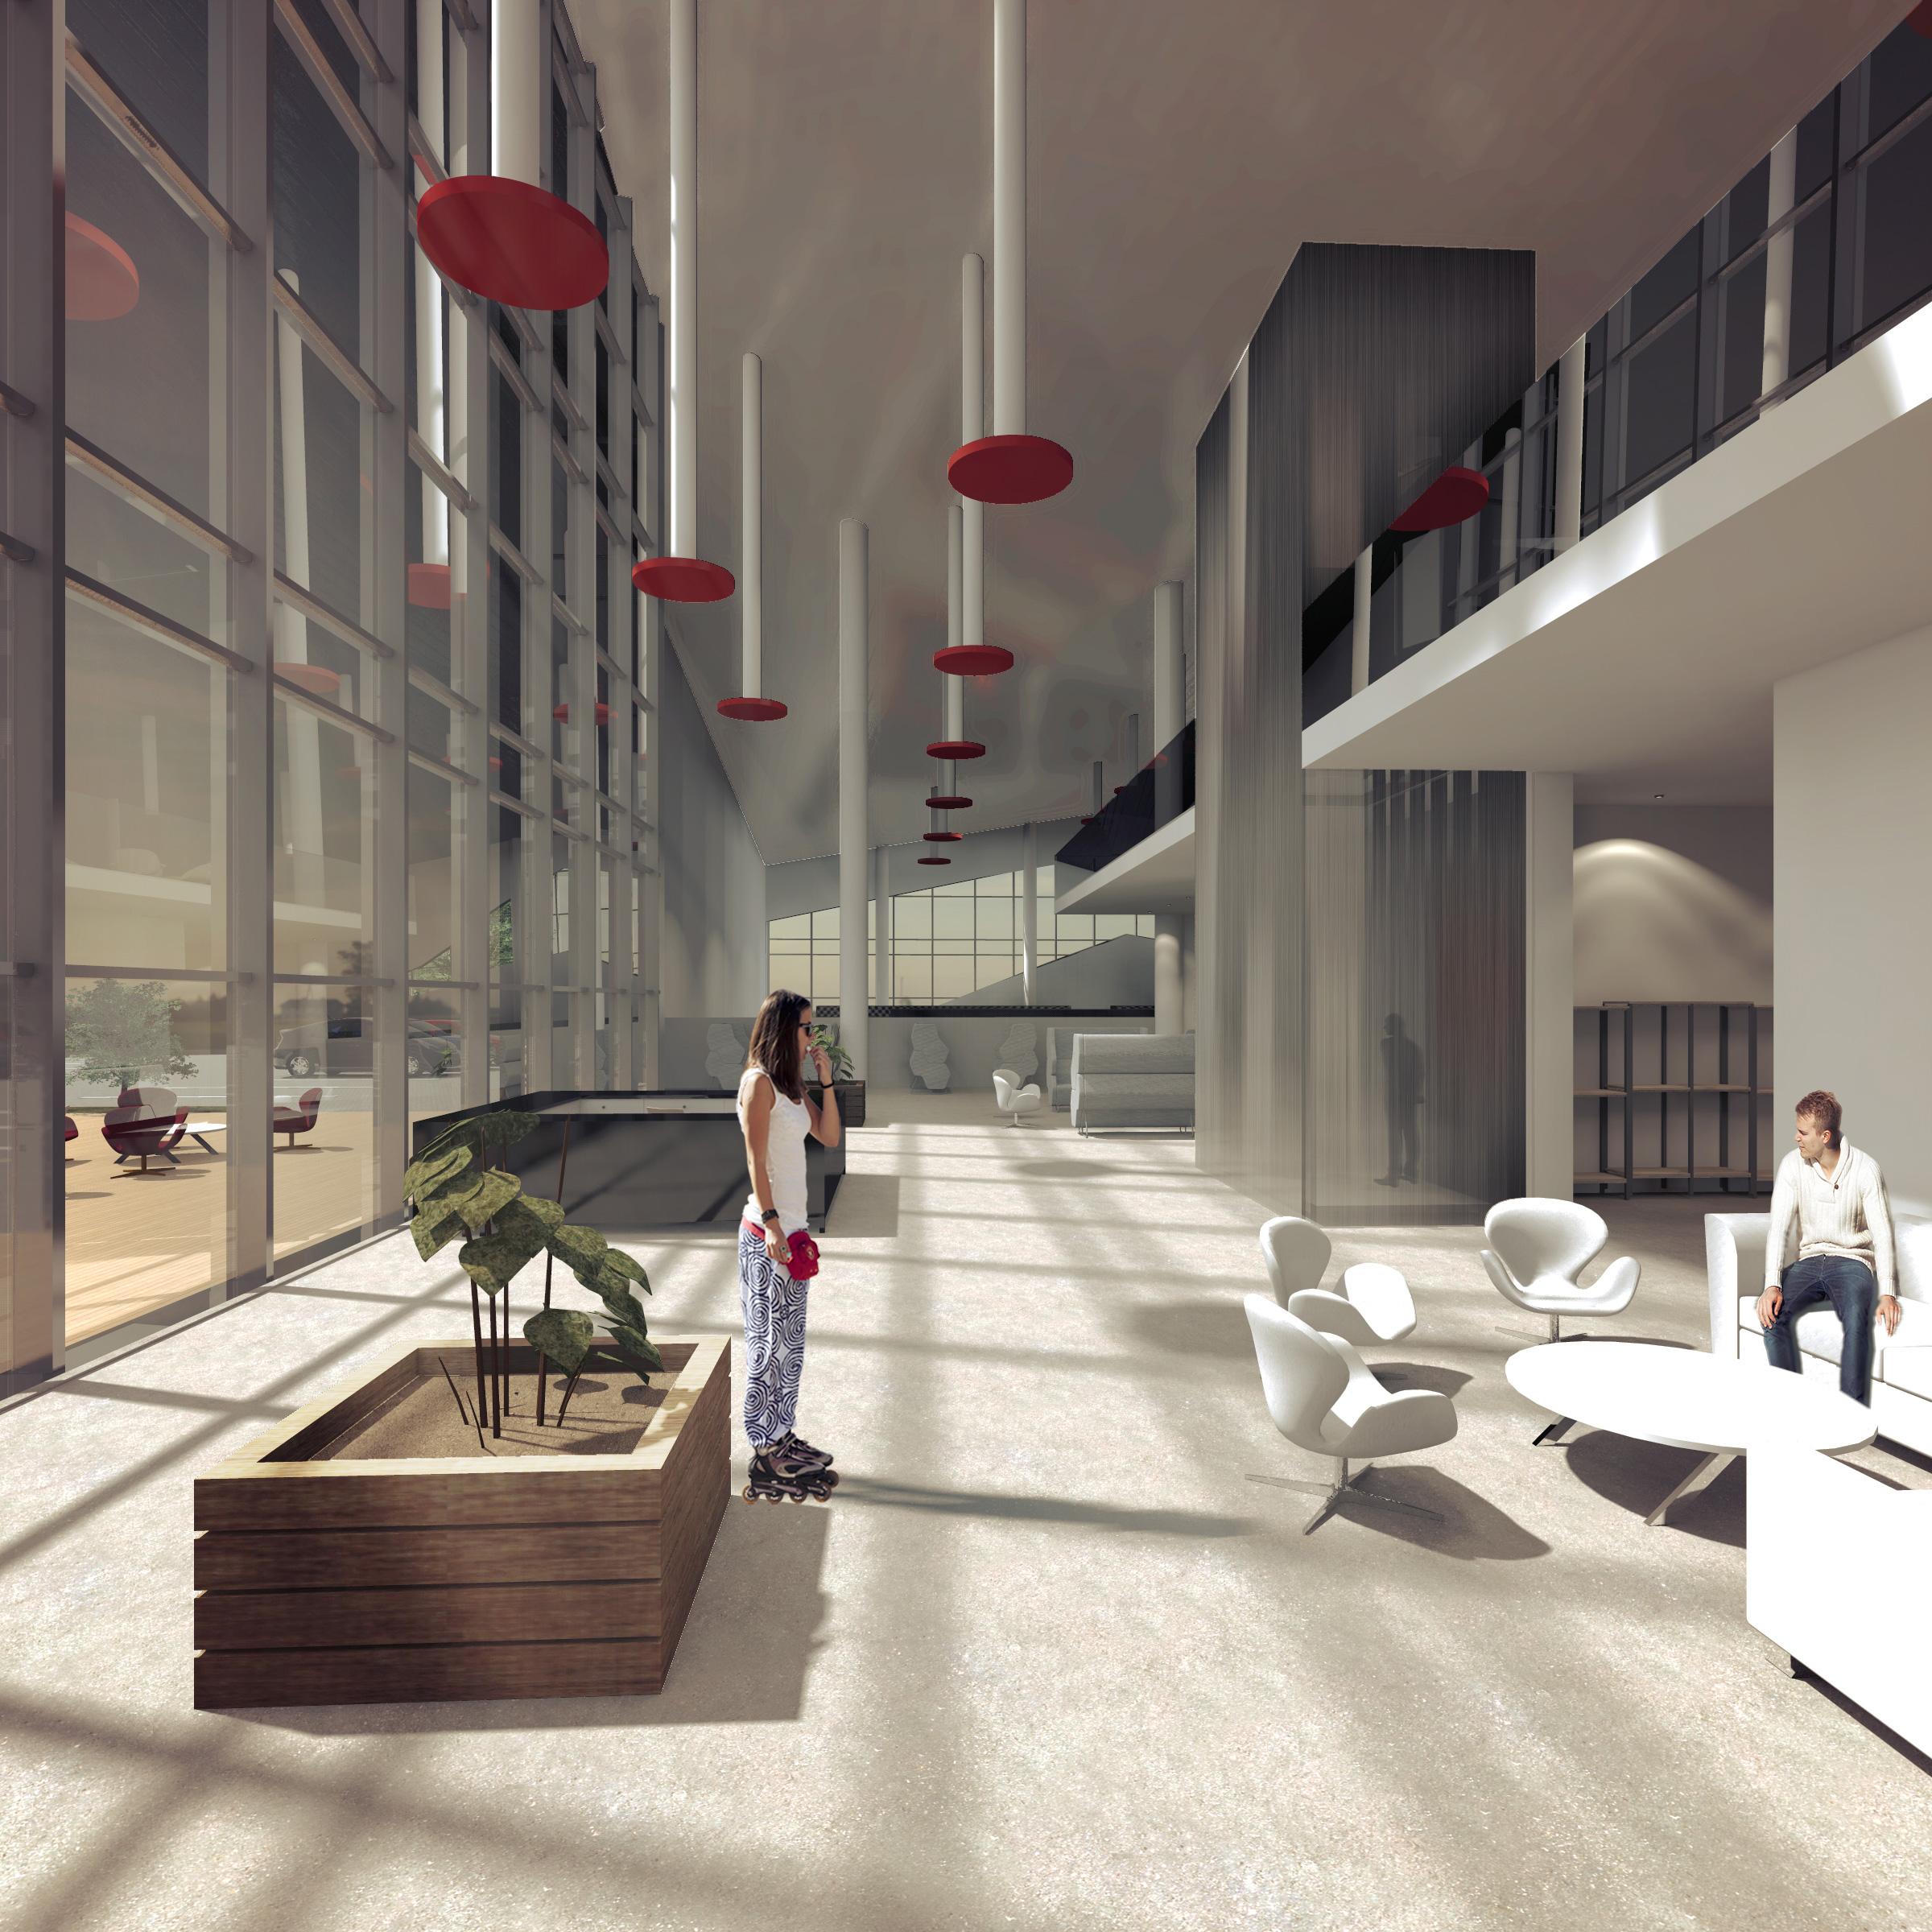 apogeum, centrum sportowe, wnetrze, biuro projektowe, lounge, chill